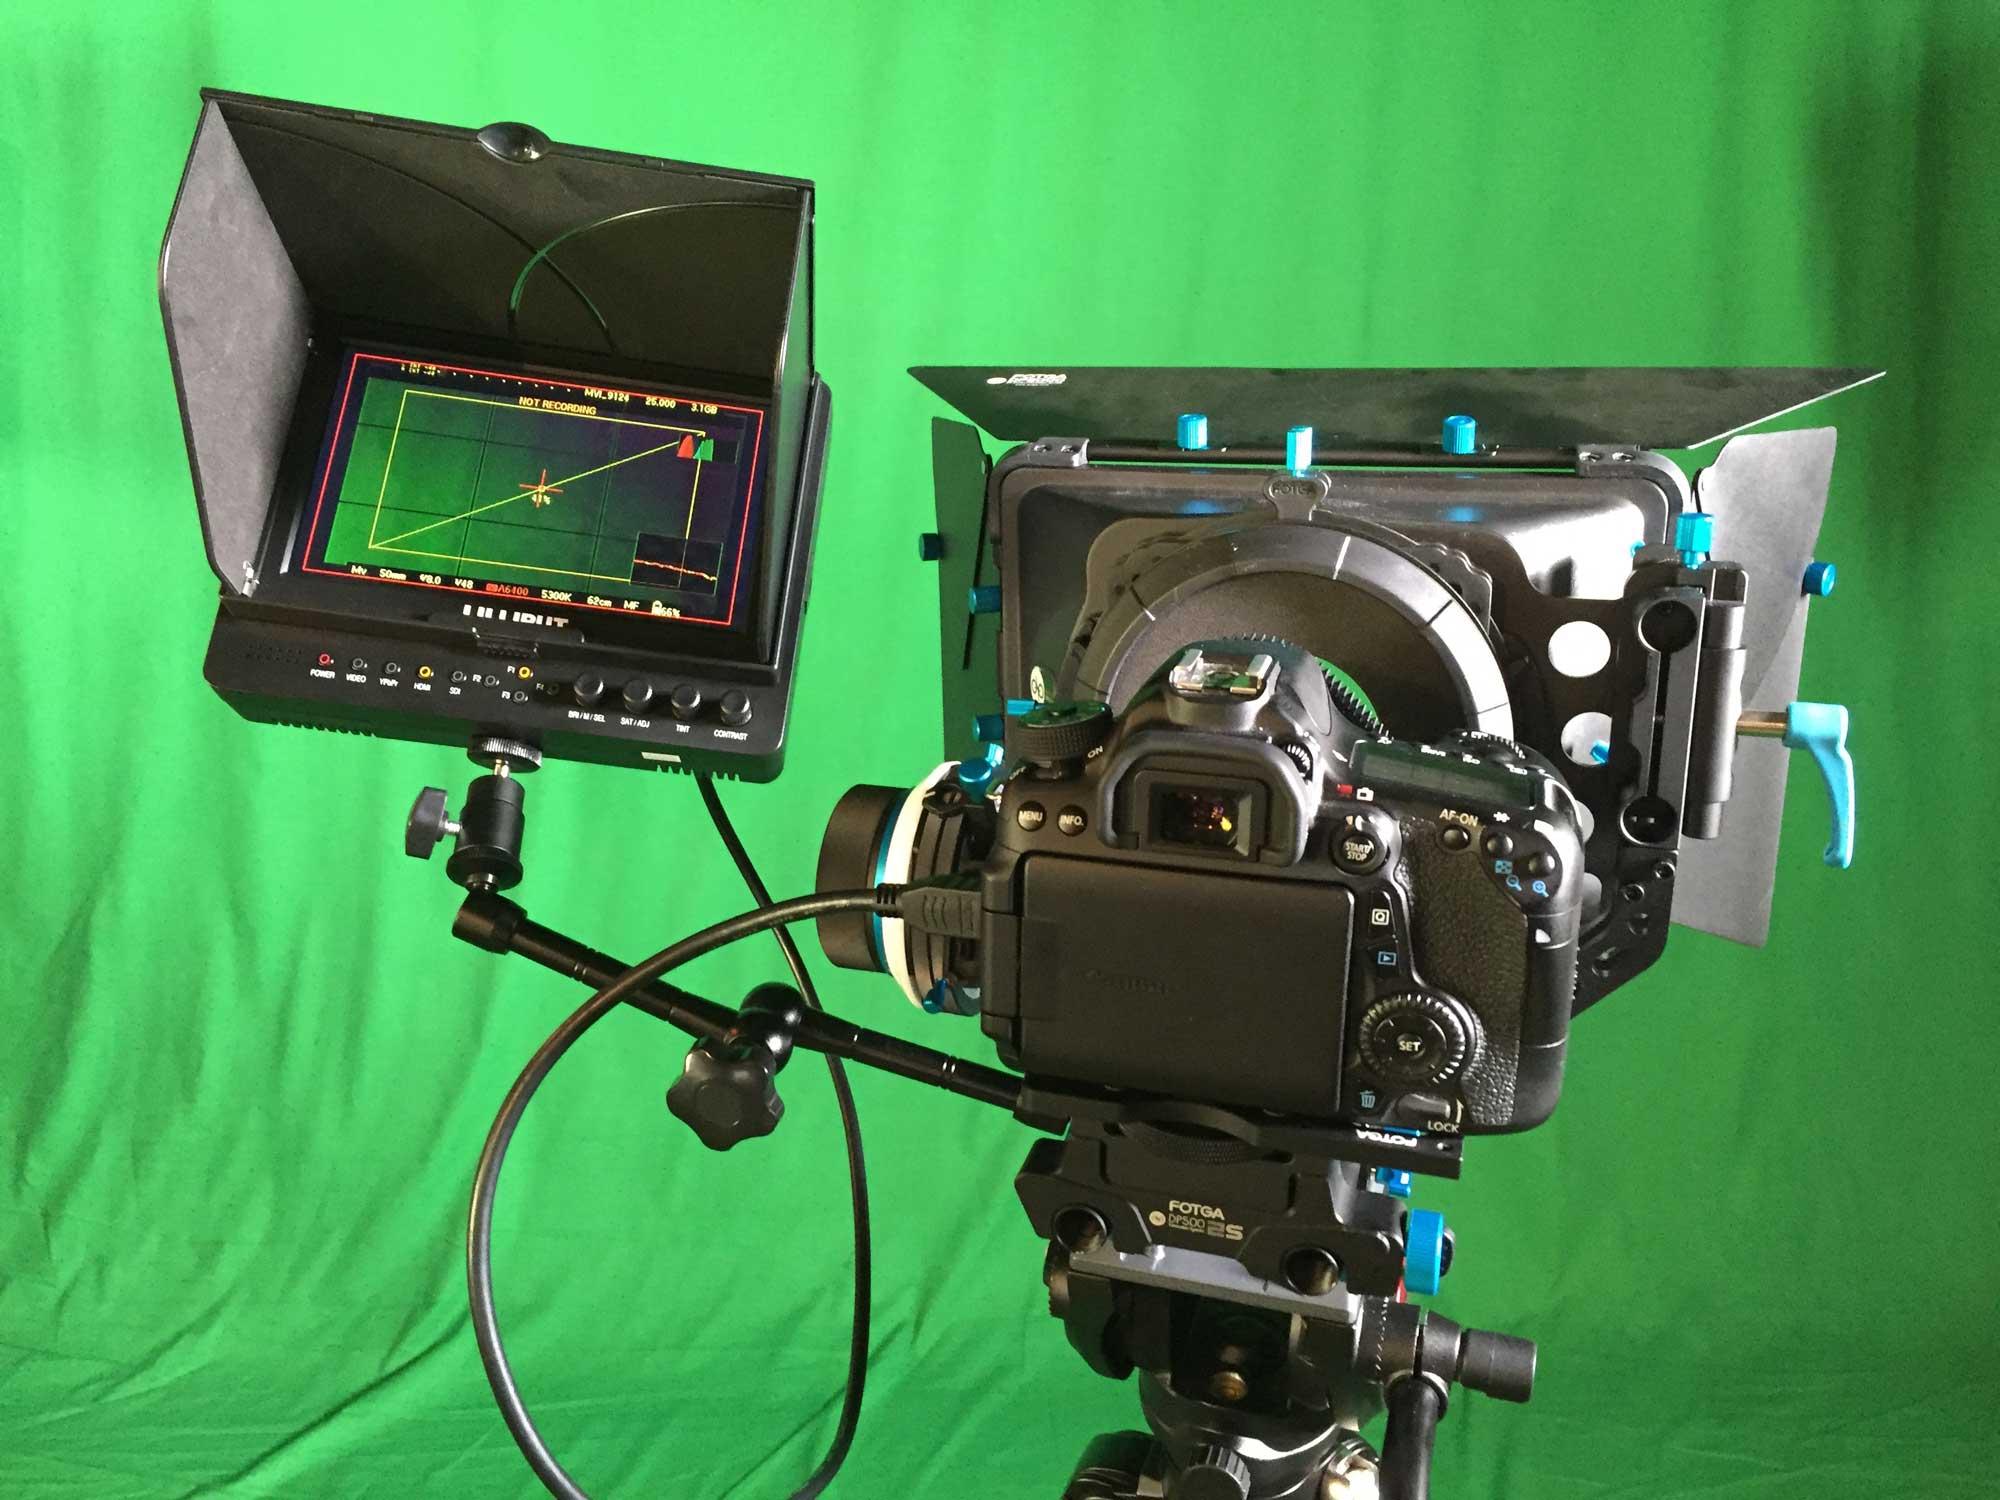 Homeoffice-Videokonferenz-Greenscreen-Technik-03